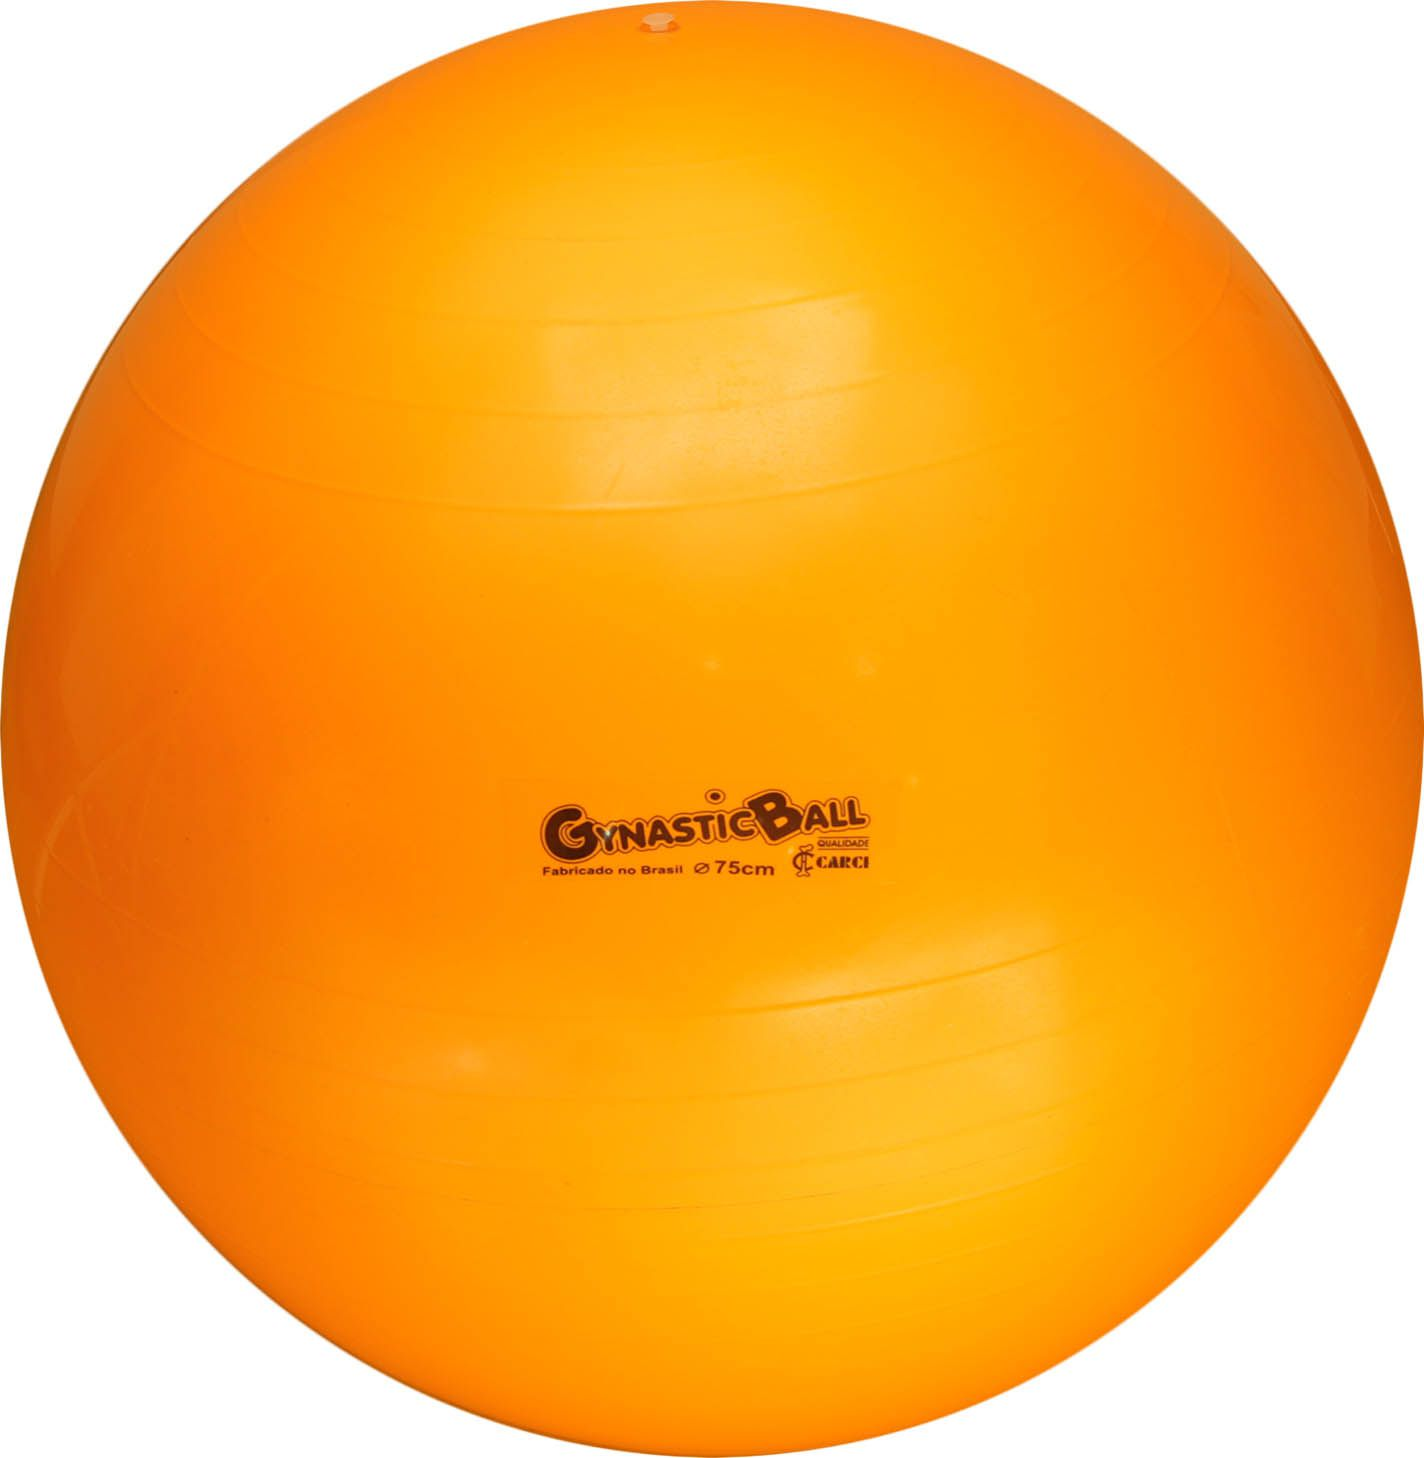 Bola suíça para pilates 75cm Gynastic Ball - laranja - BL.01.75